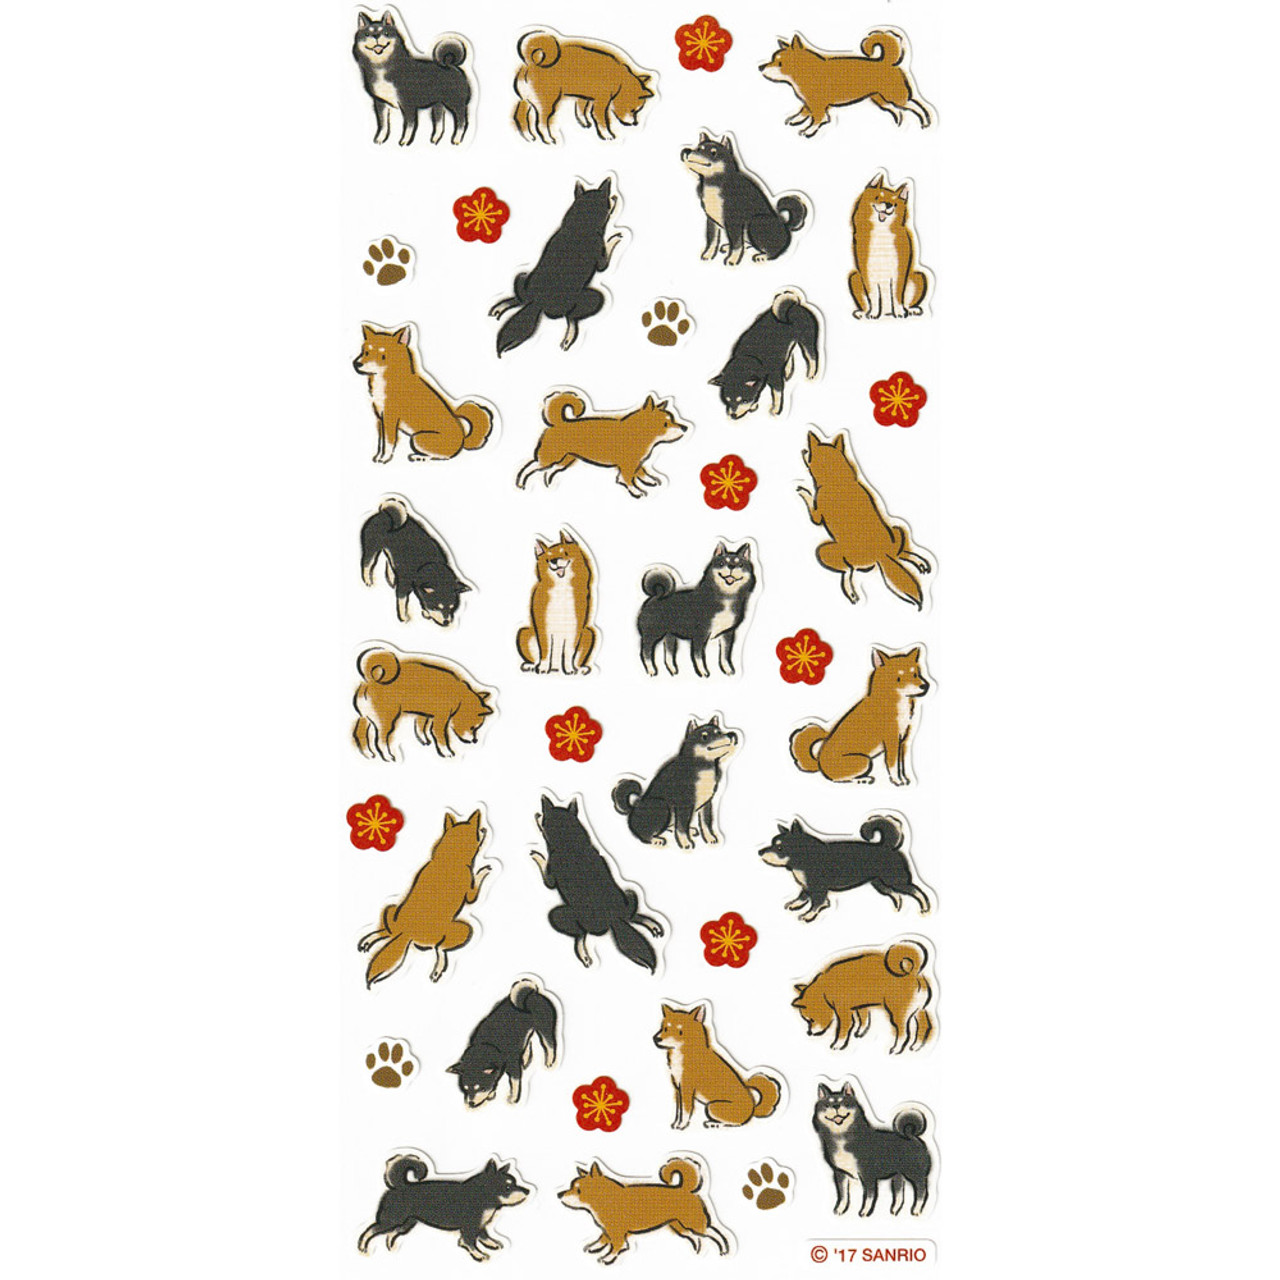 Sanrio Super Cute Shiba Inu Dog New Year's greetings Sticker Sheet ( Feature 02 )